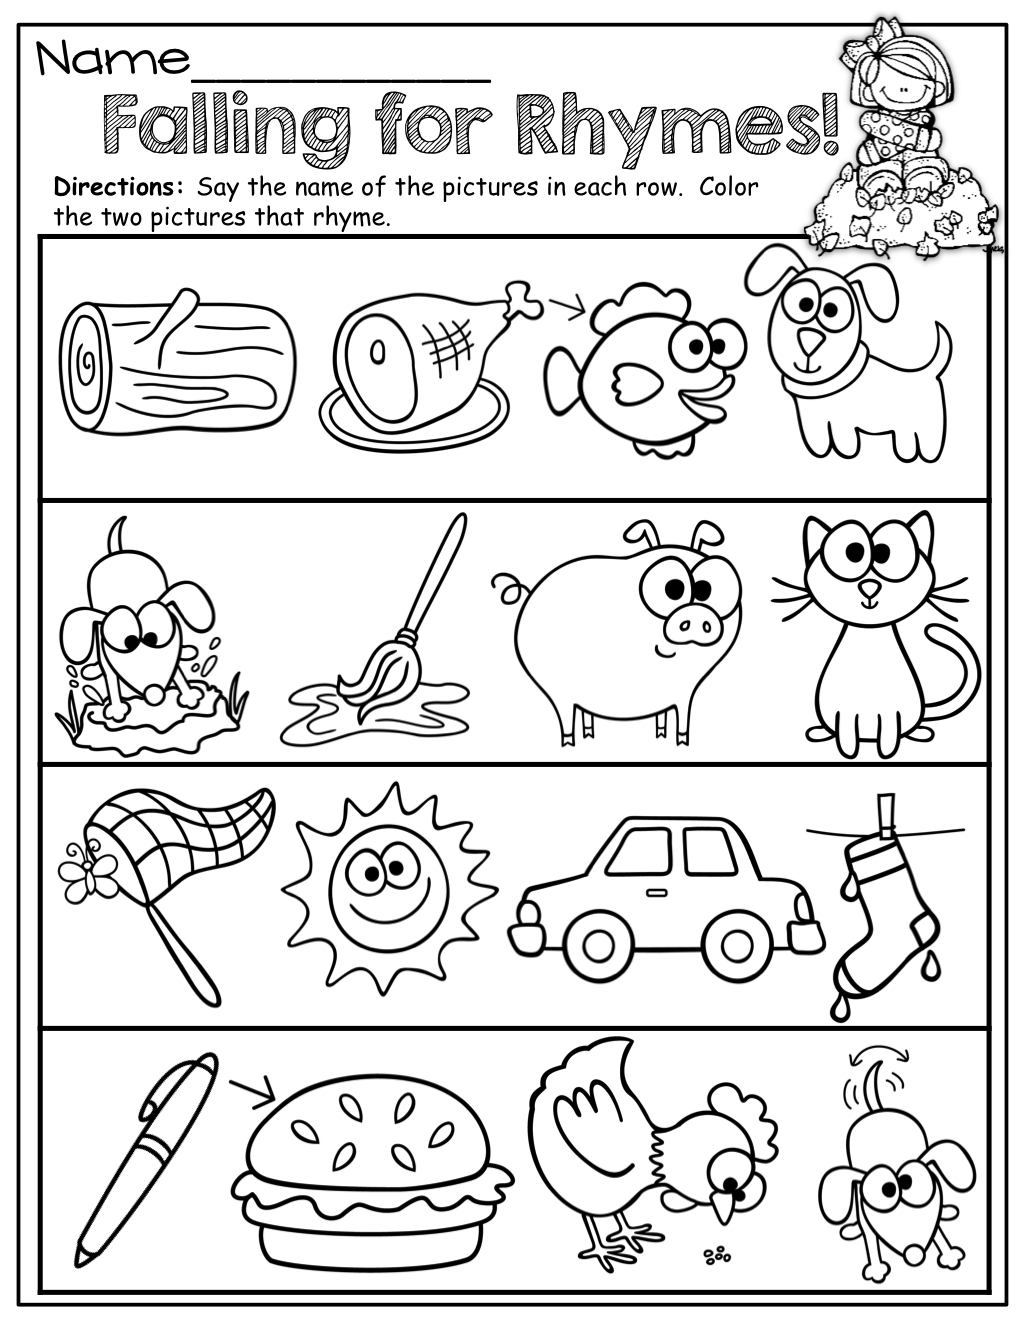 Rhyming Words School Worksheets Samples Literacy And Math Worksheets Free